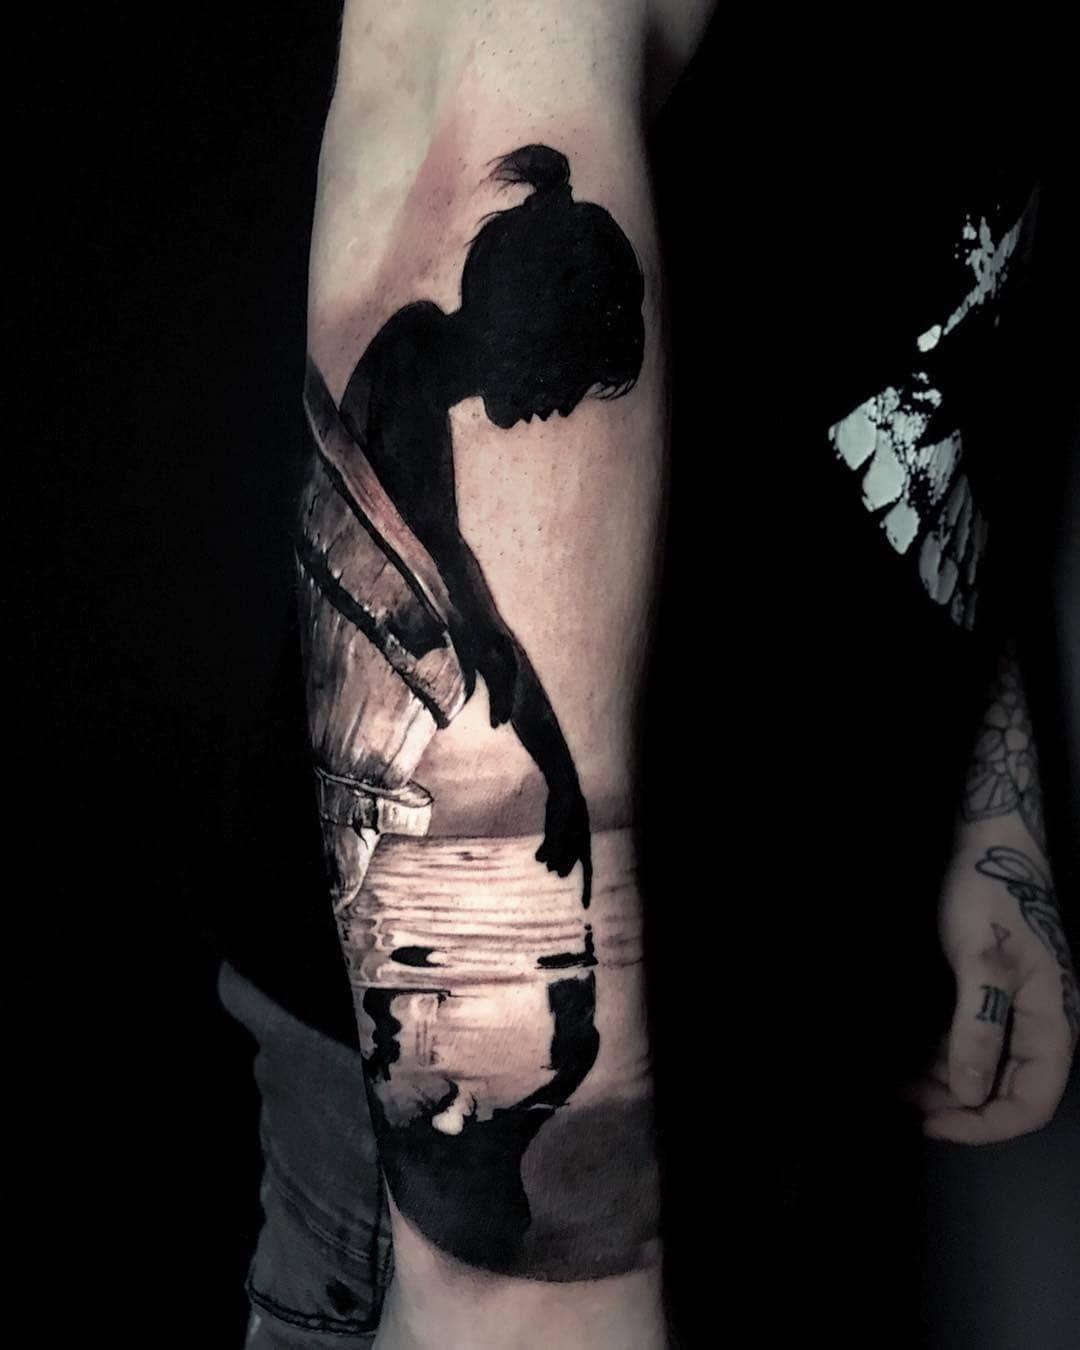  current mood: THINKful.  Whatsapp: 017655003665 . . . . . #tattoos #ink #inked #tattooed #tattooartist  #tattooart #tattoolife #instatattoo #inkedup #tattooist  #tattooer #blackandgrey #girlswithtattoos #beautiful #blackandgreytattoo #tatts #inkaddict #tatted  #dortmund #dortmundtattoo  #tattoo #drawing #illustration #tätowierer #kunst #inkspiration #artoftheday #germantattooers #tattoed #topclasstattooing